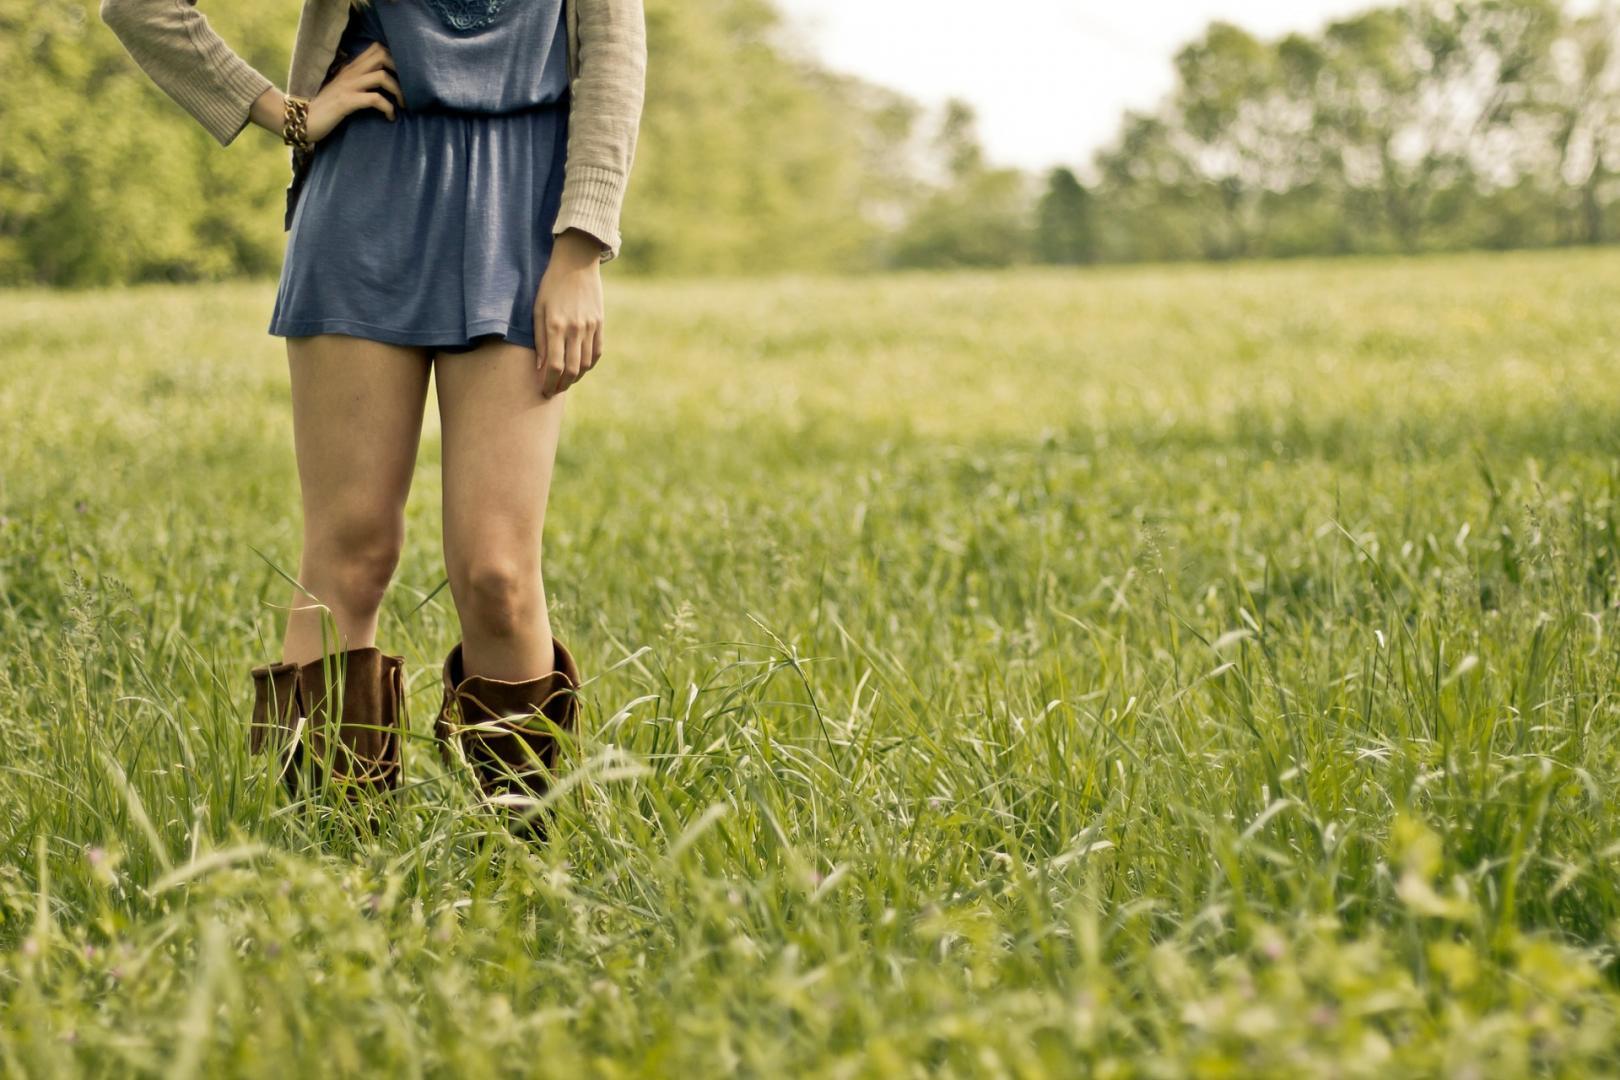 Countrygirl